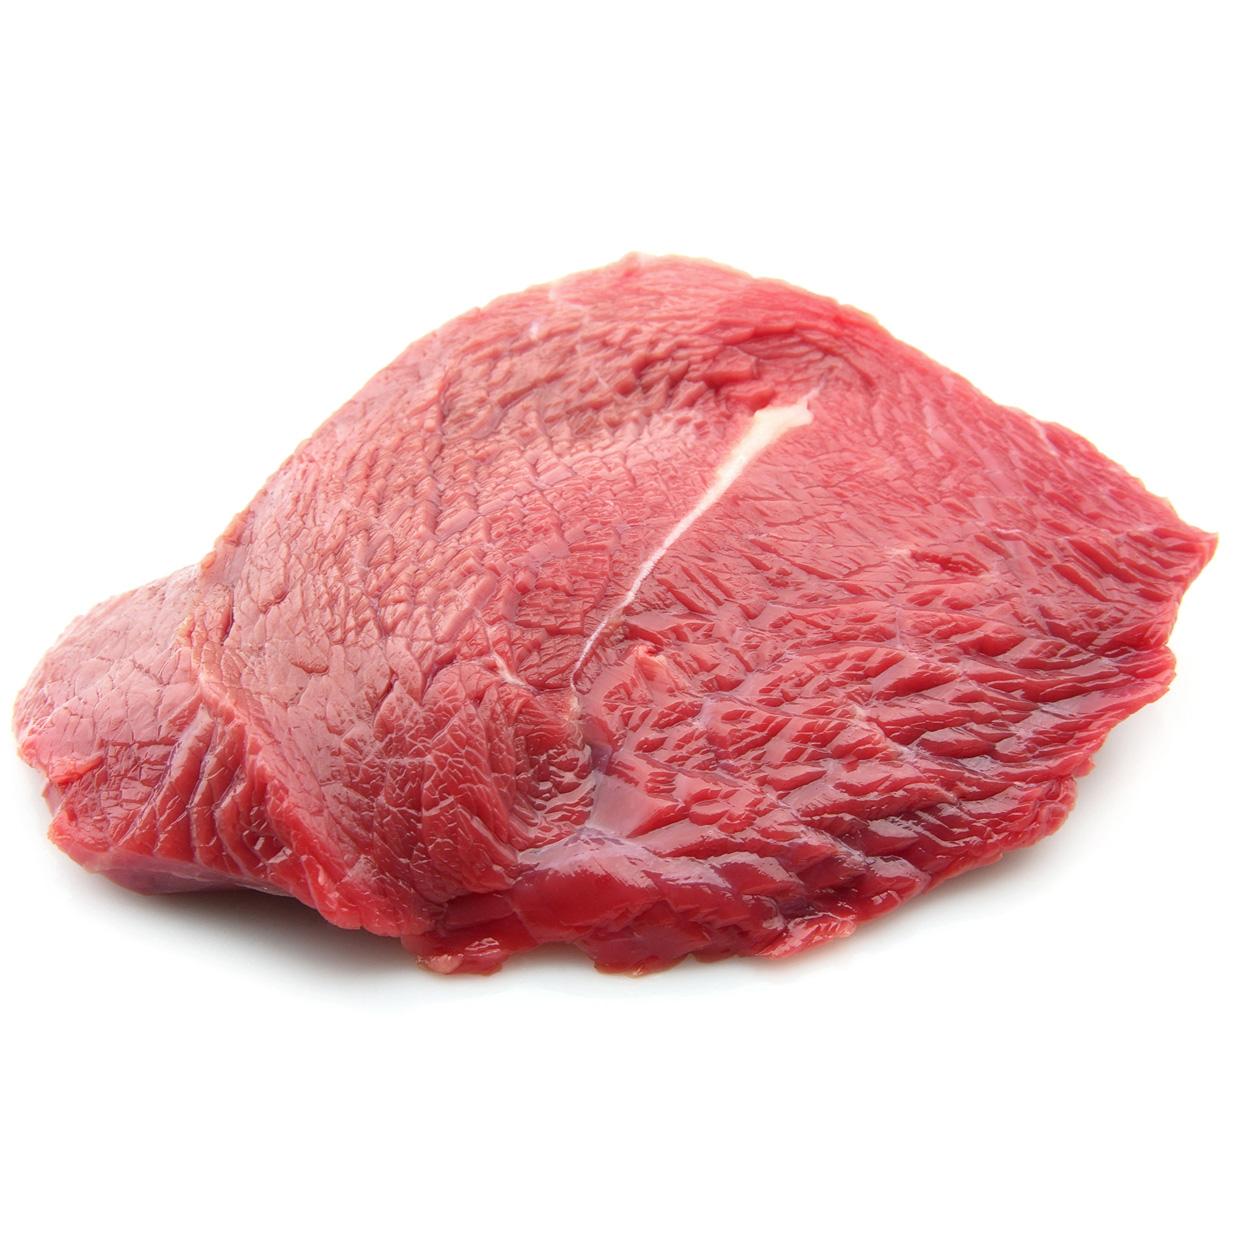 Steak de rumsteak boeuf (x 1 ou x 2, environ 250-300 g)